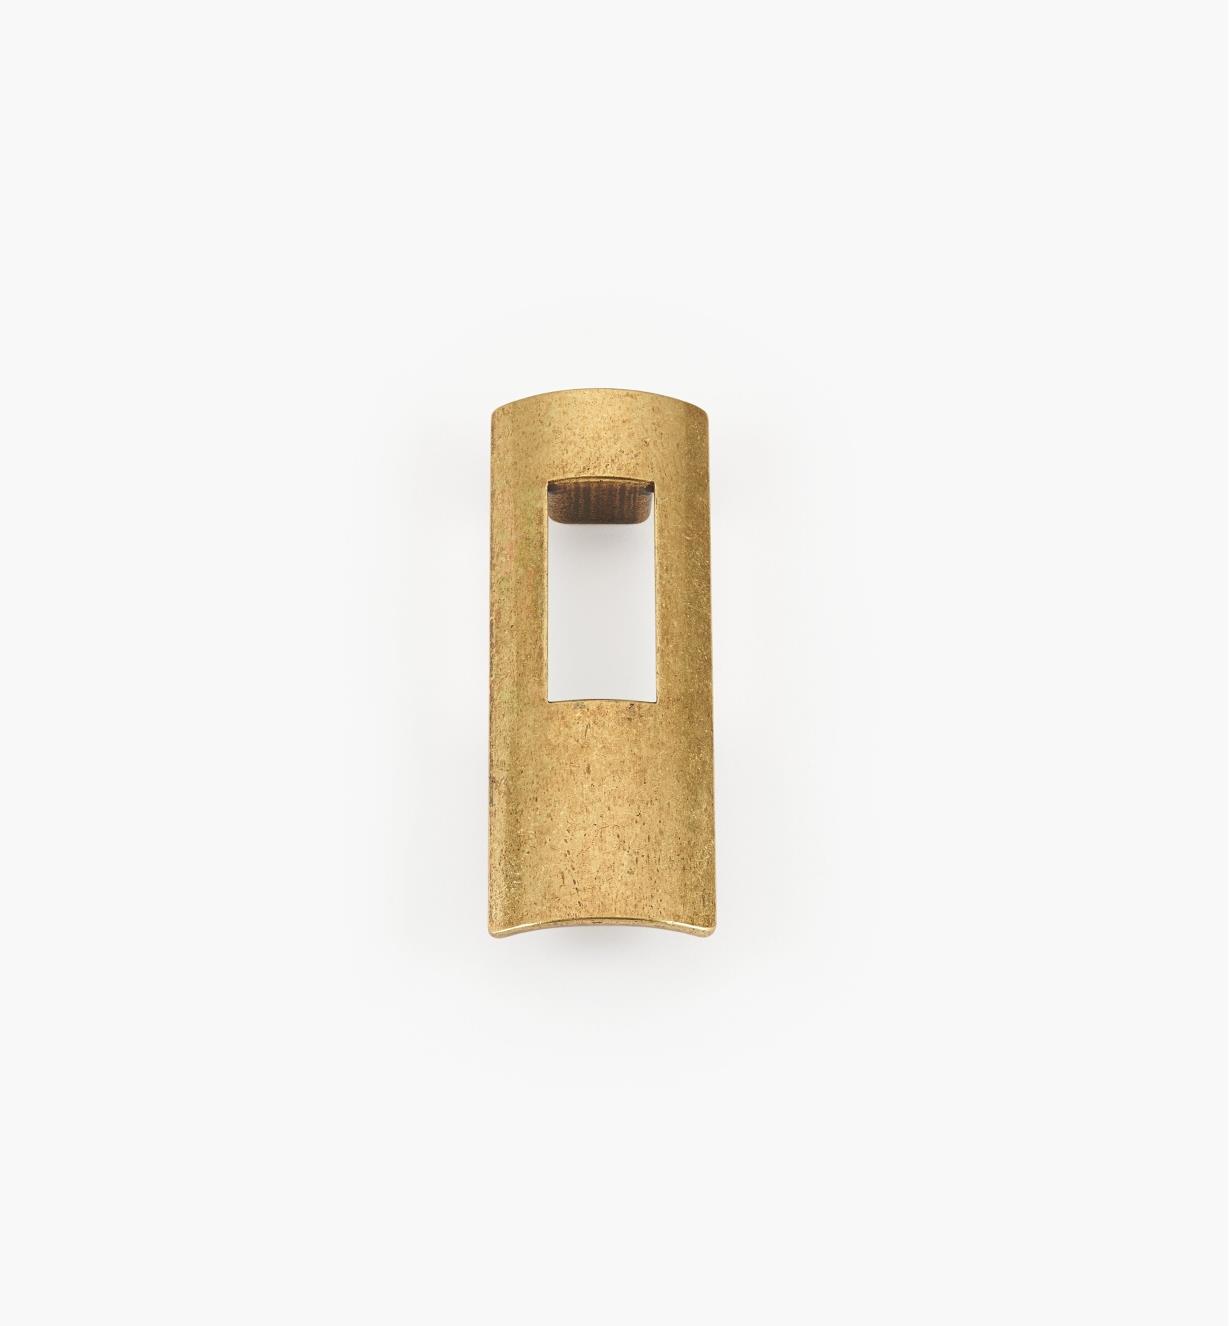 01G1922 - 64mm x 88mm Antique Brass Portal Pull